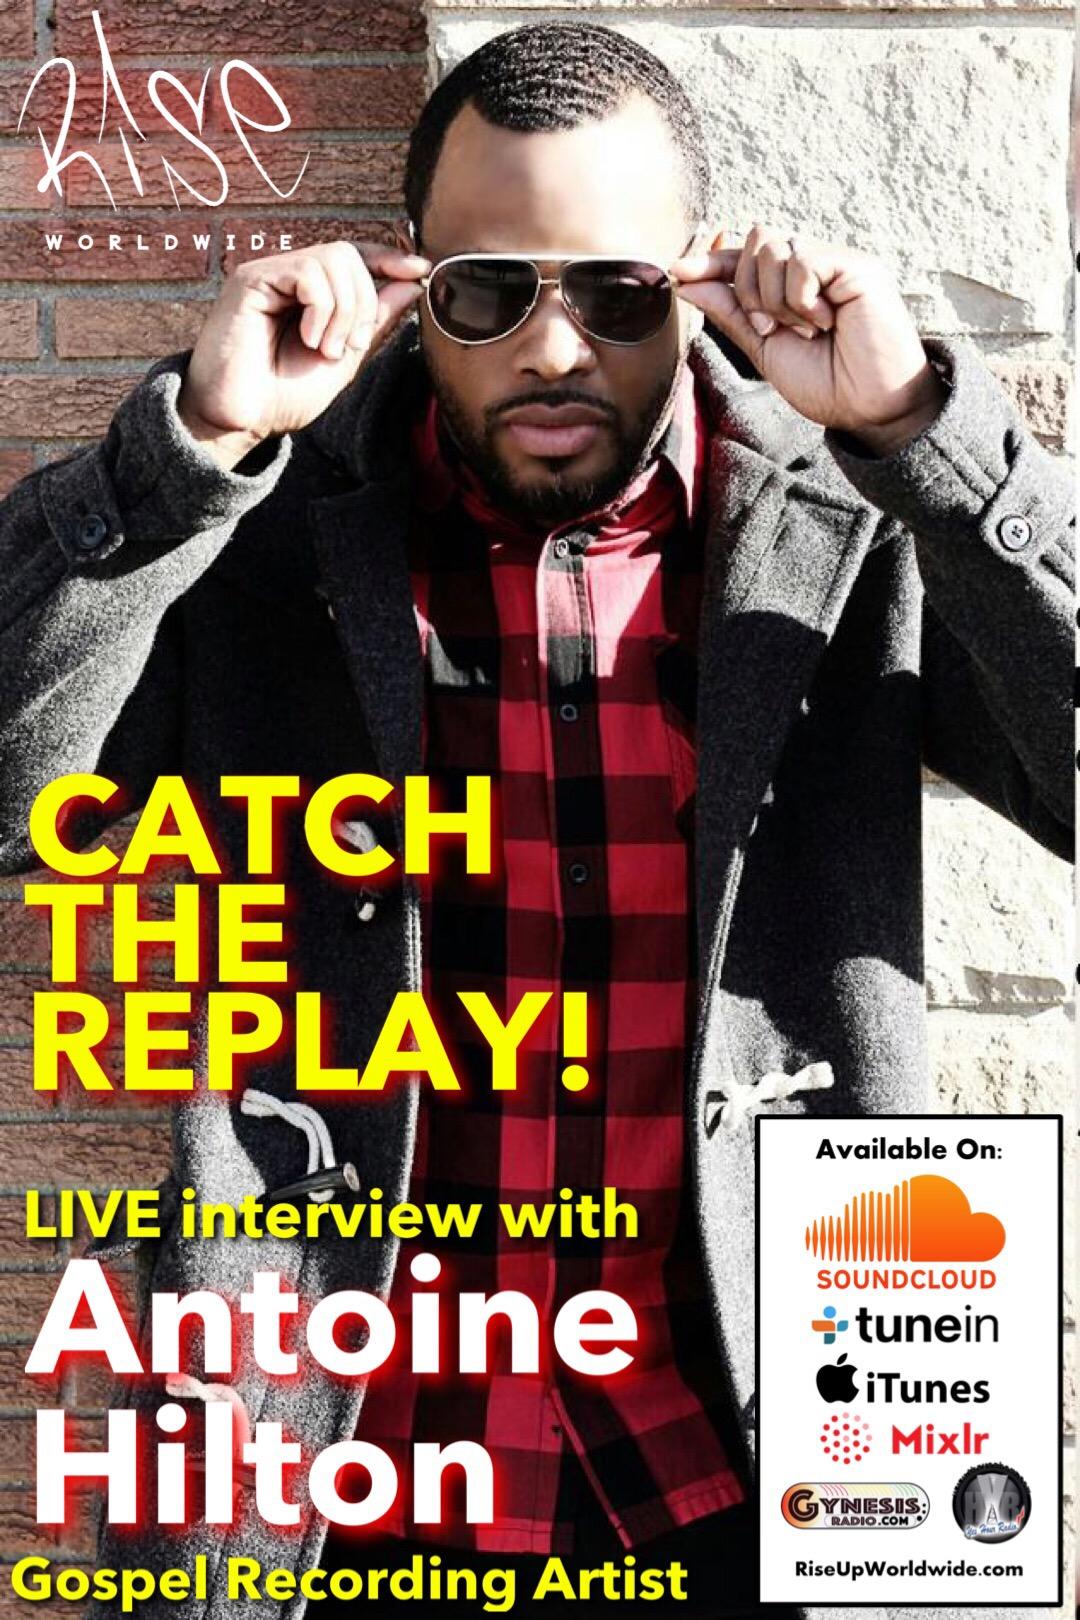 Rise Up Worldwide Radio Show: Episode #53 - Ft Antoine Hilton